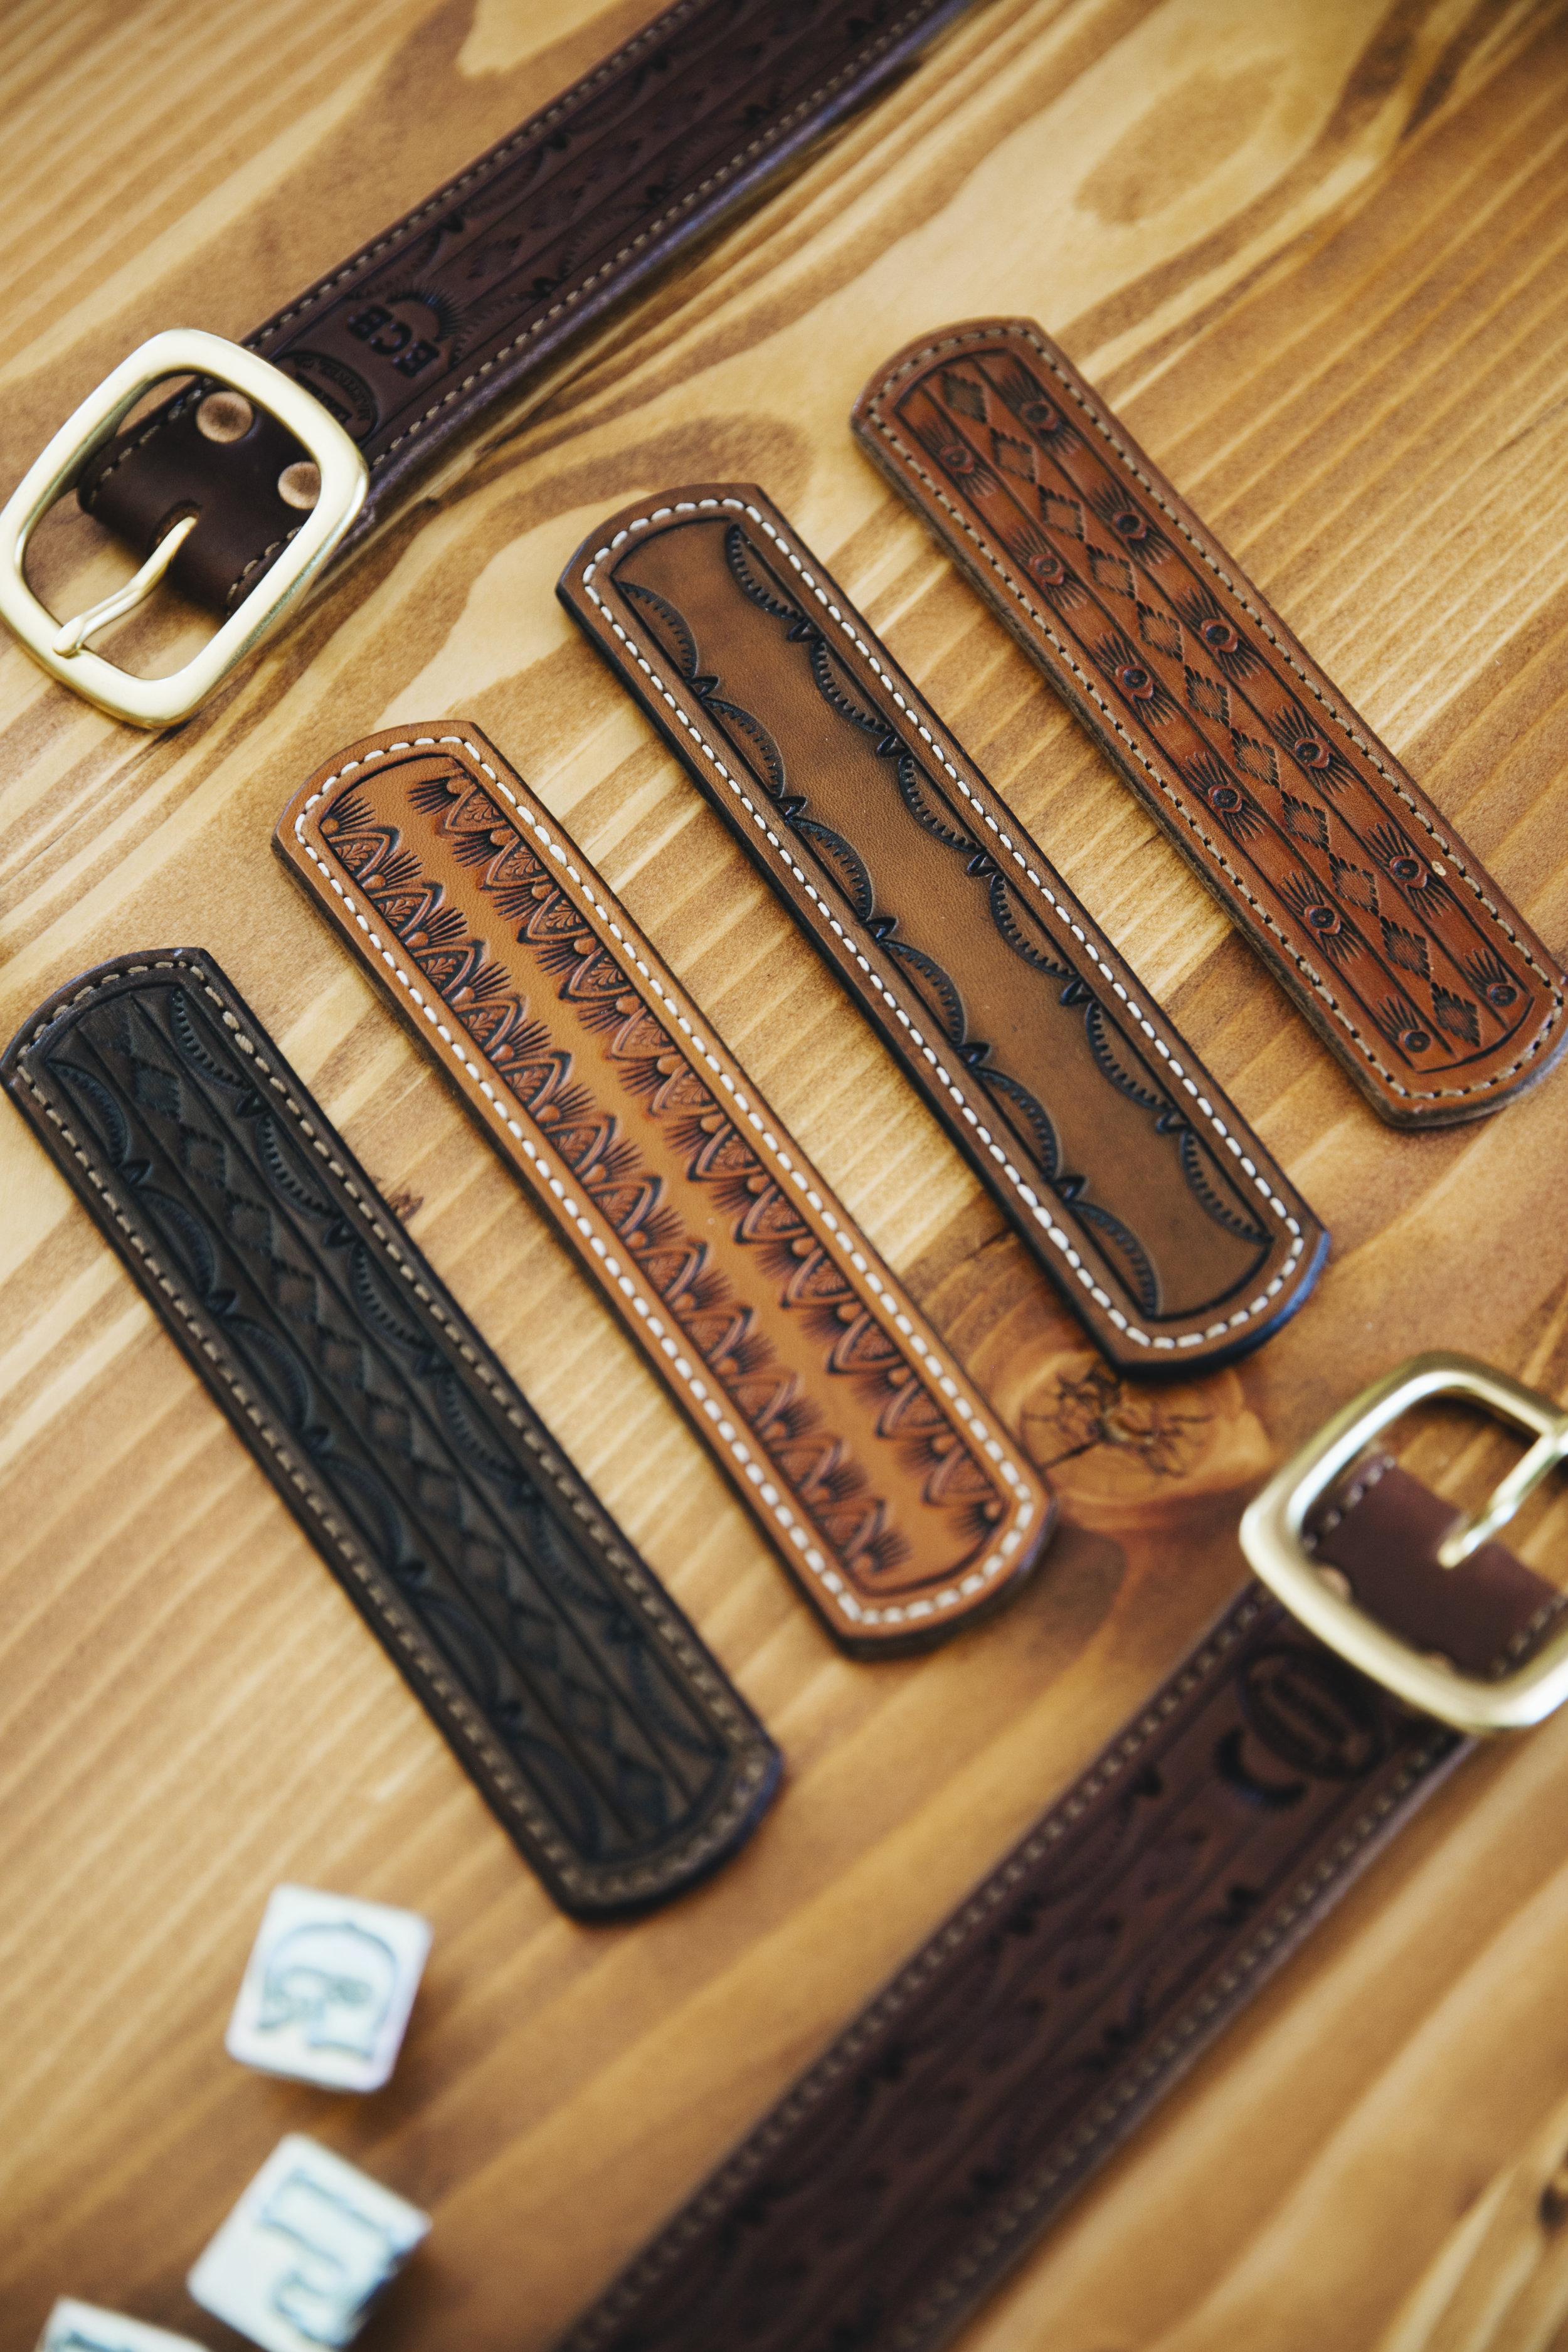 Barbered Leather Handmade Belts in Martinez California